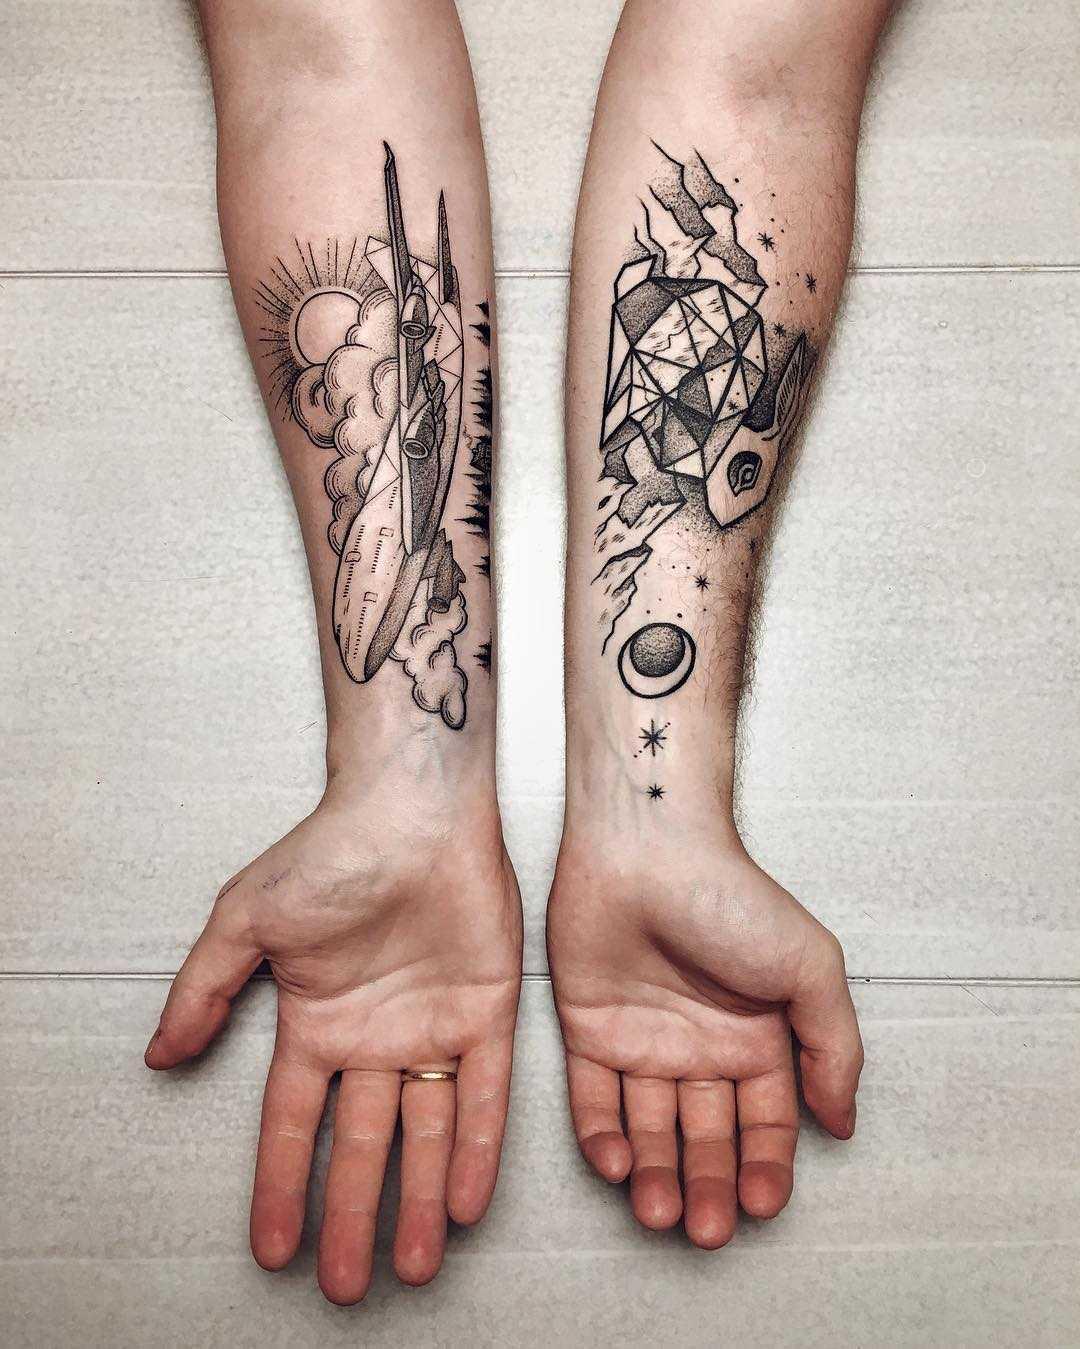 Plane and polygonal rabbit tattoos